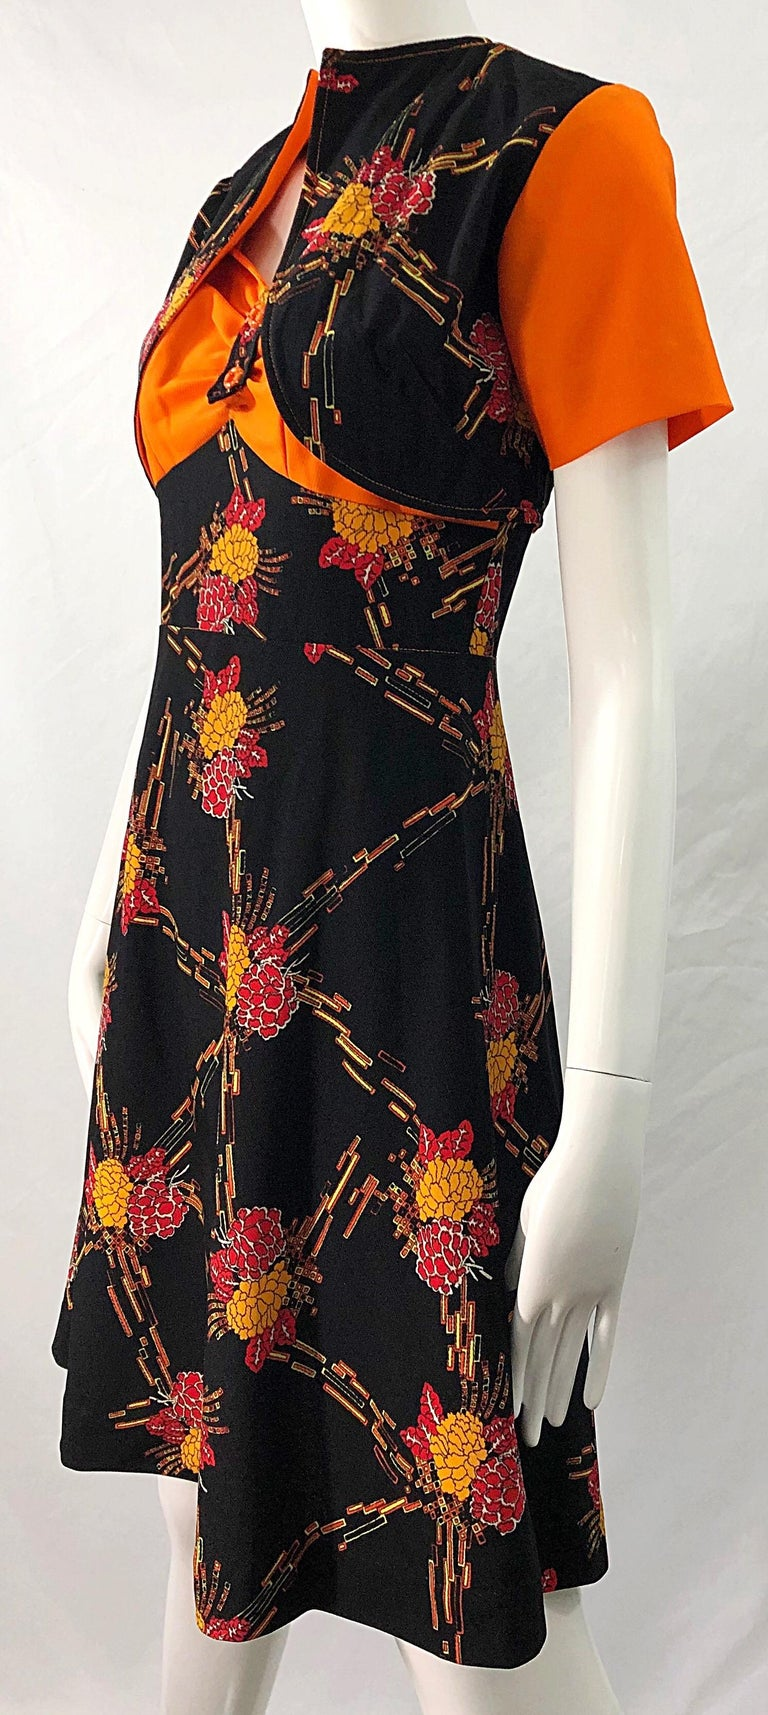 1970s Autumnal Digital Floral Print Knit Vintage 70s A Line Dress + Bolero Top For Sale 12